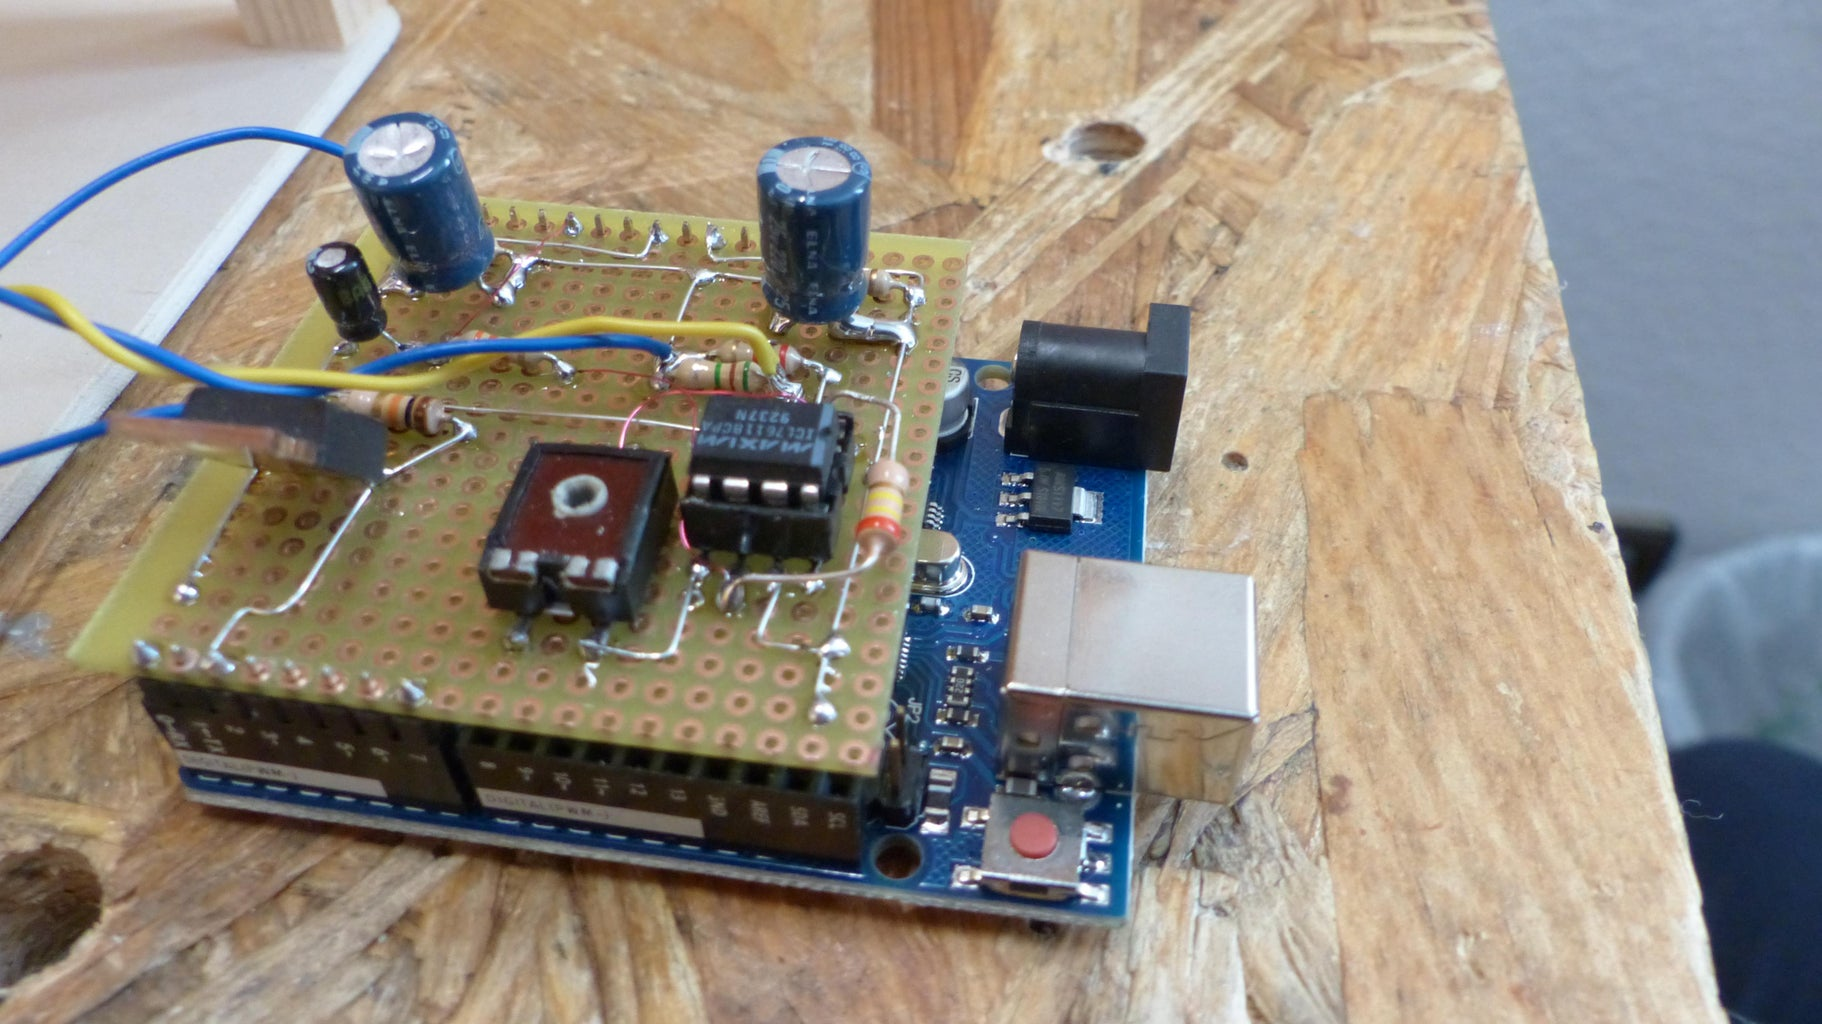 Making the Electronics